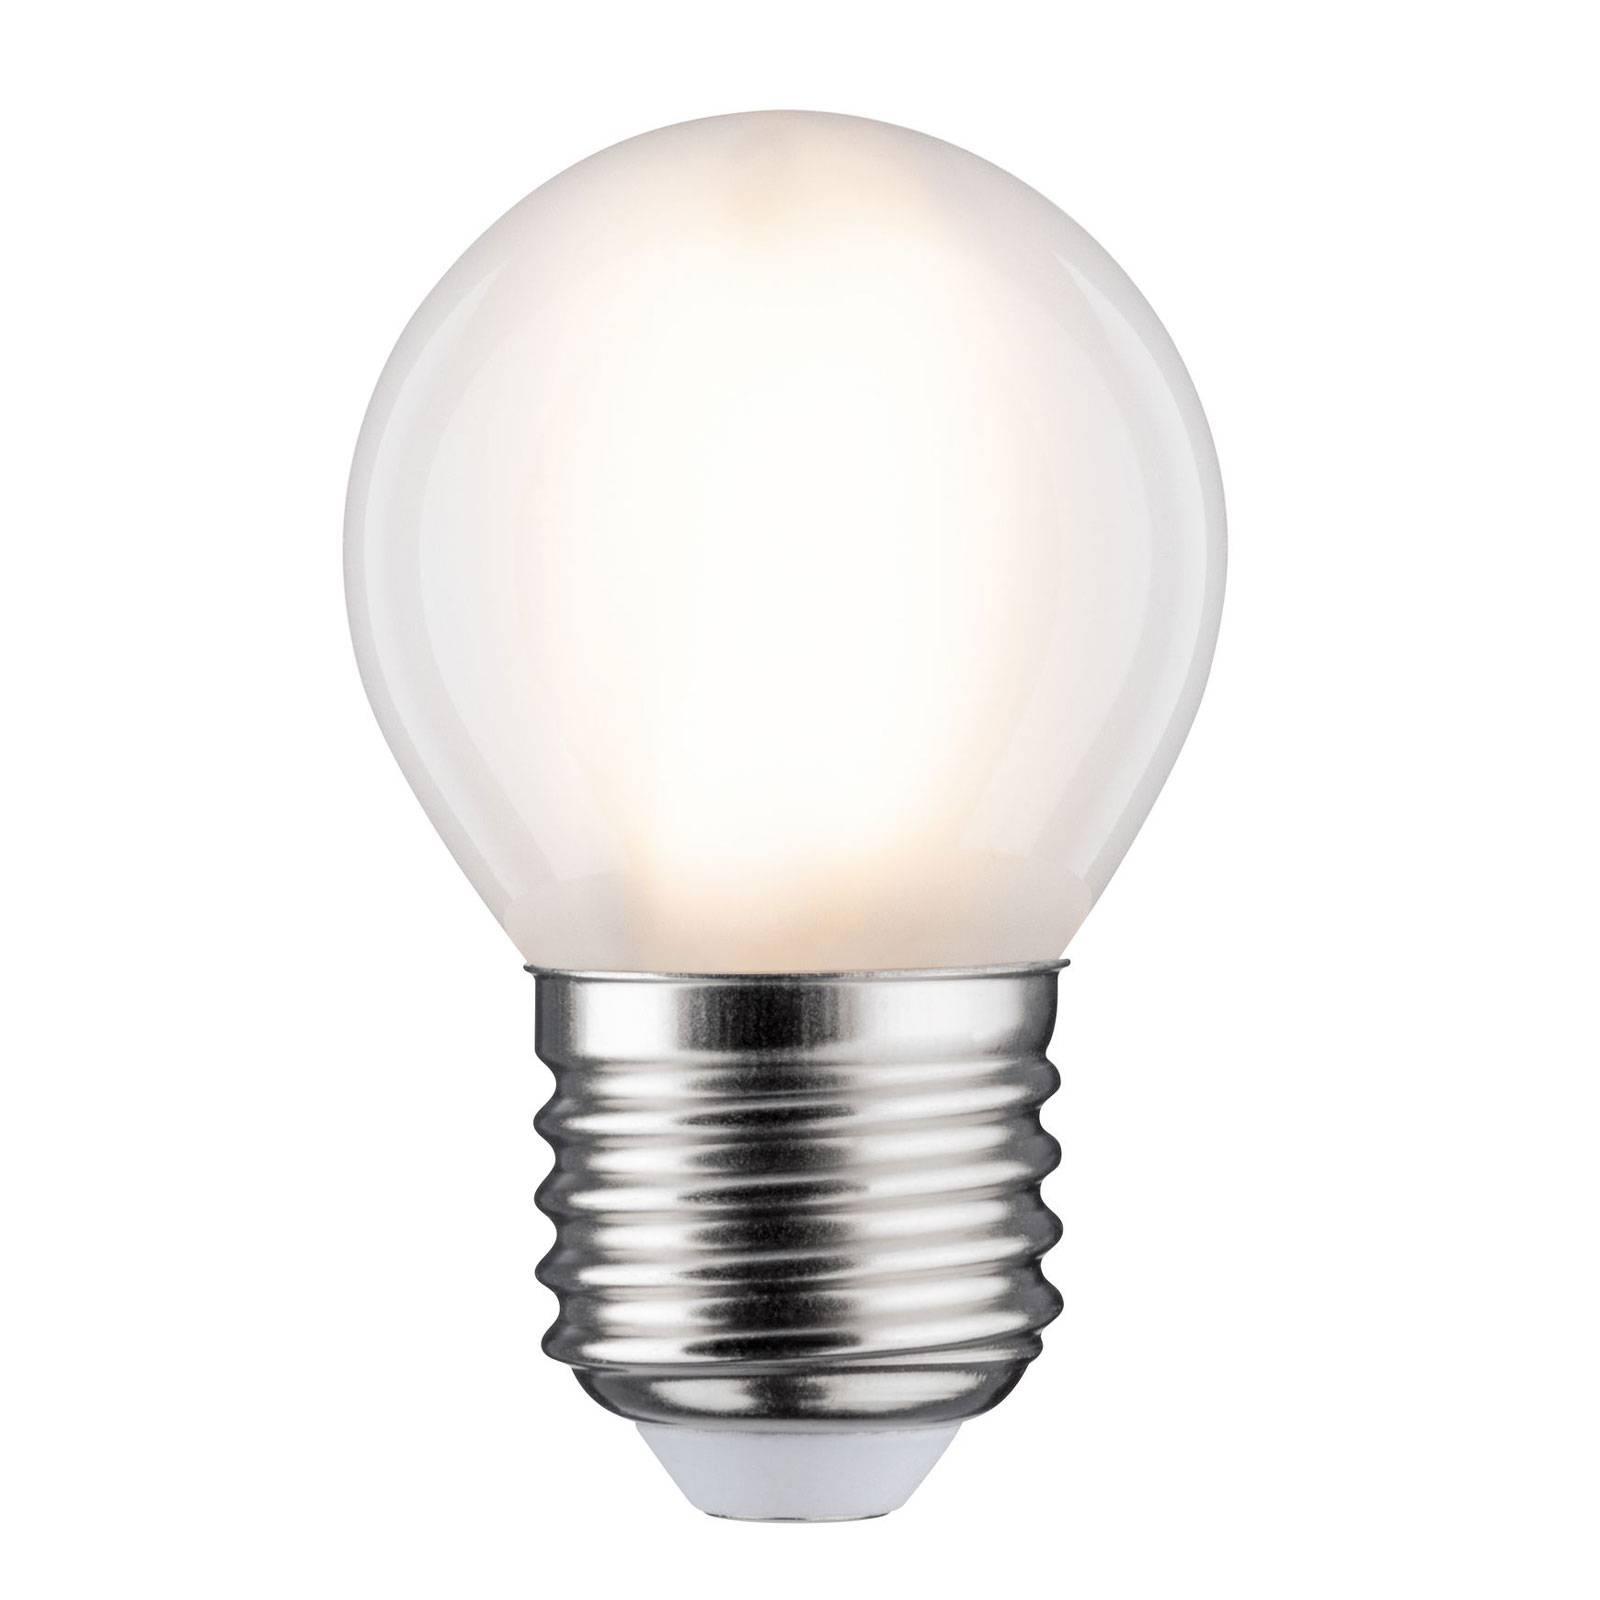 LED-lamppu E27 5W pisara 2 700 K matta